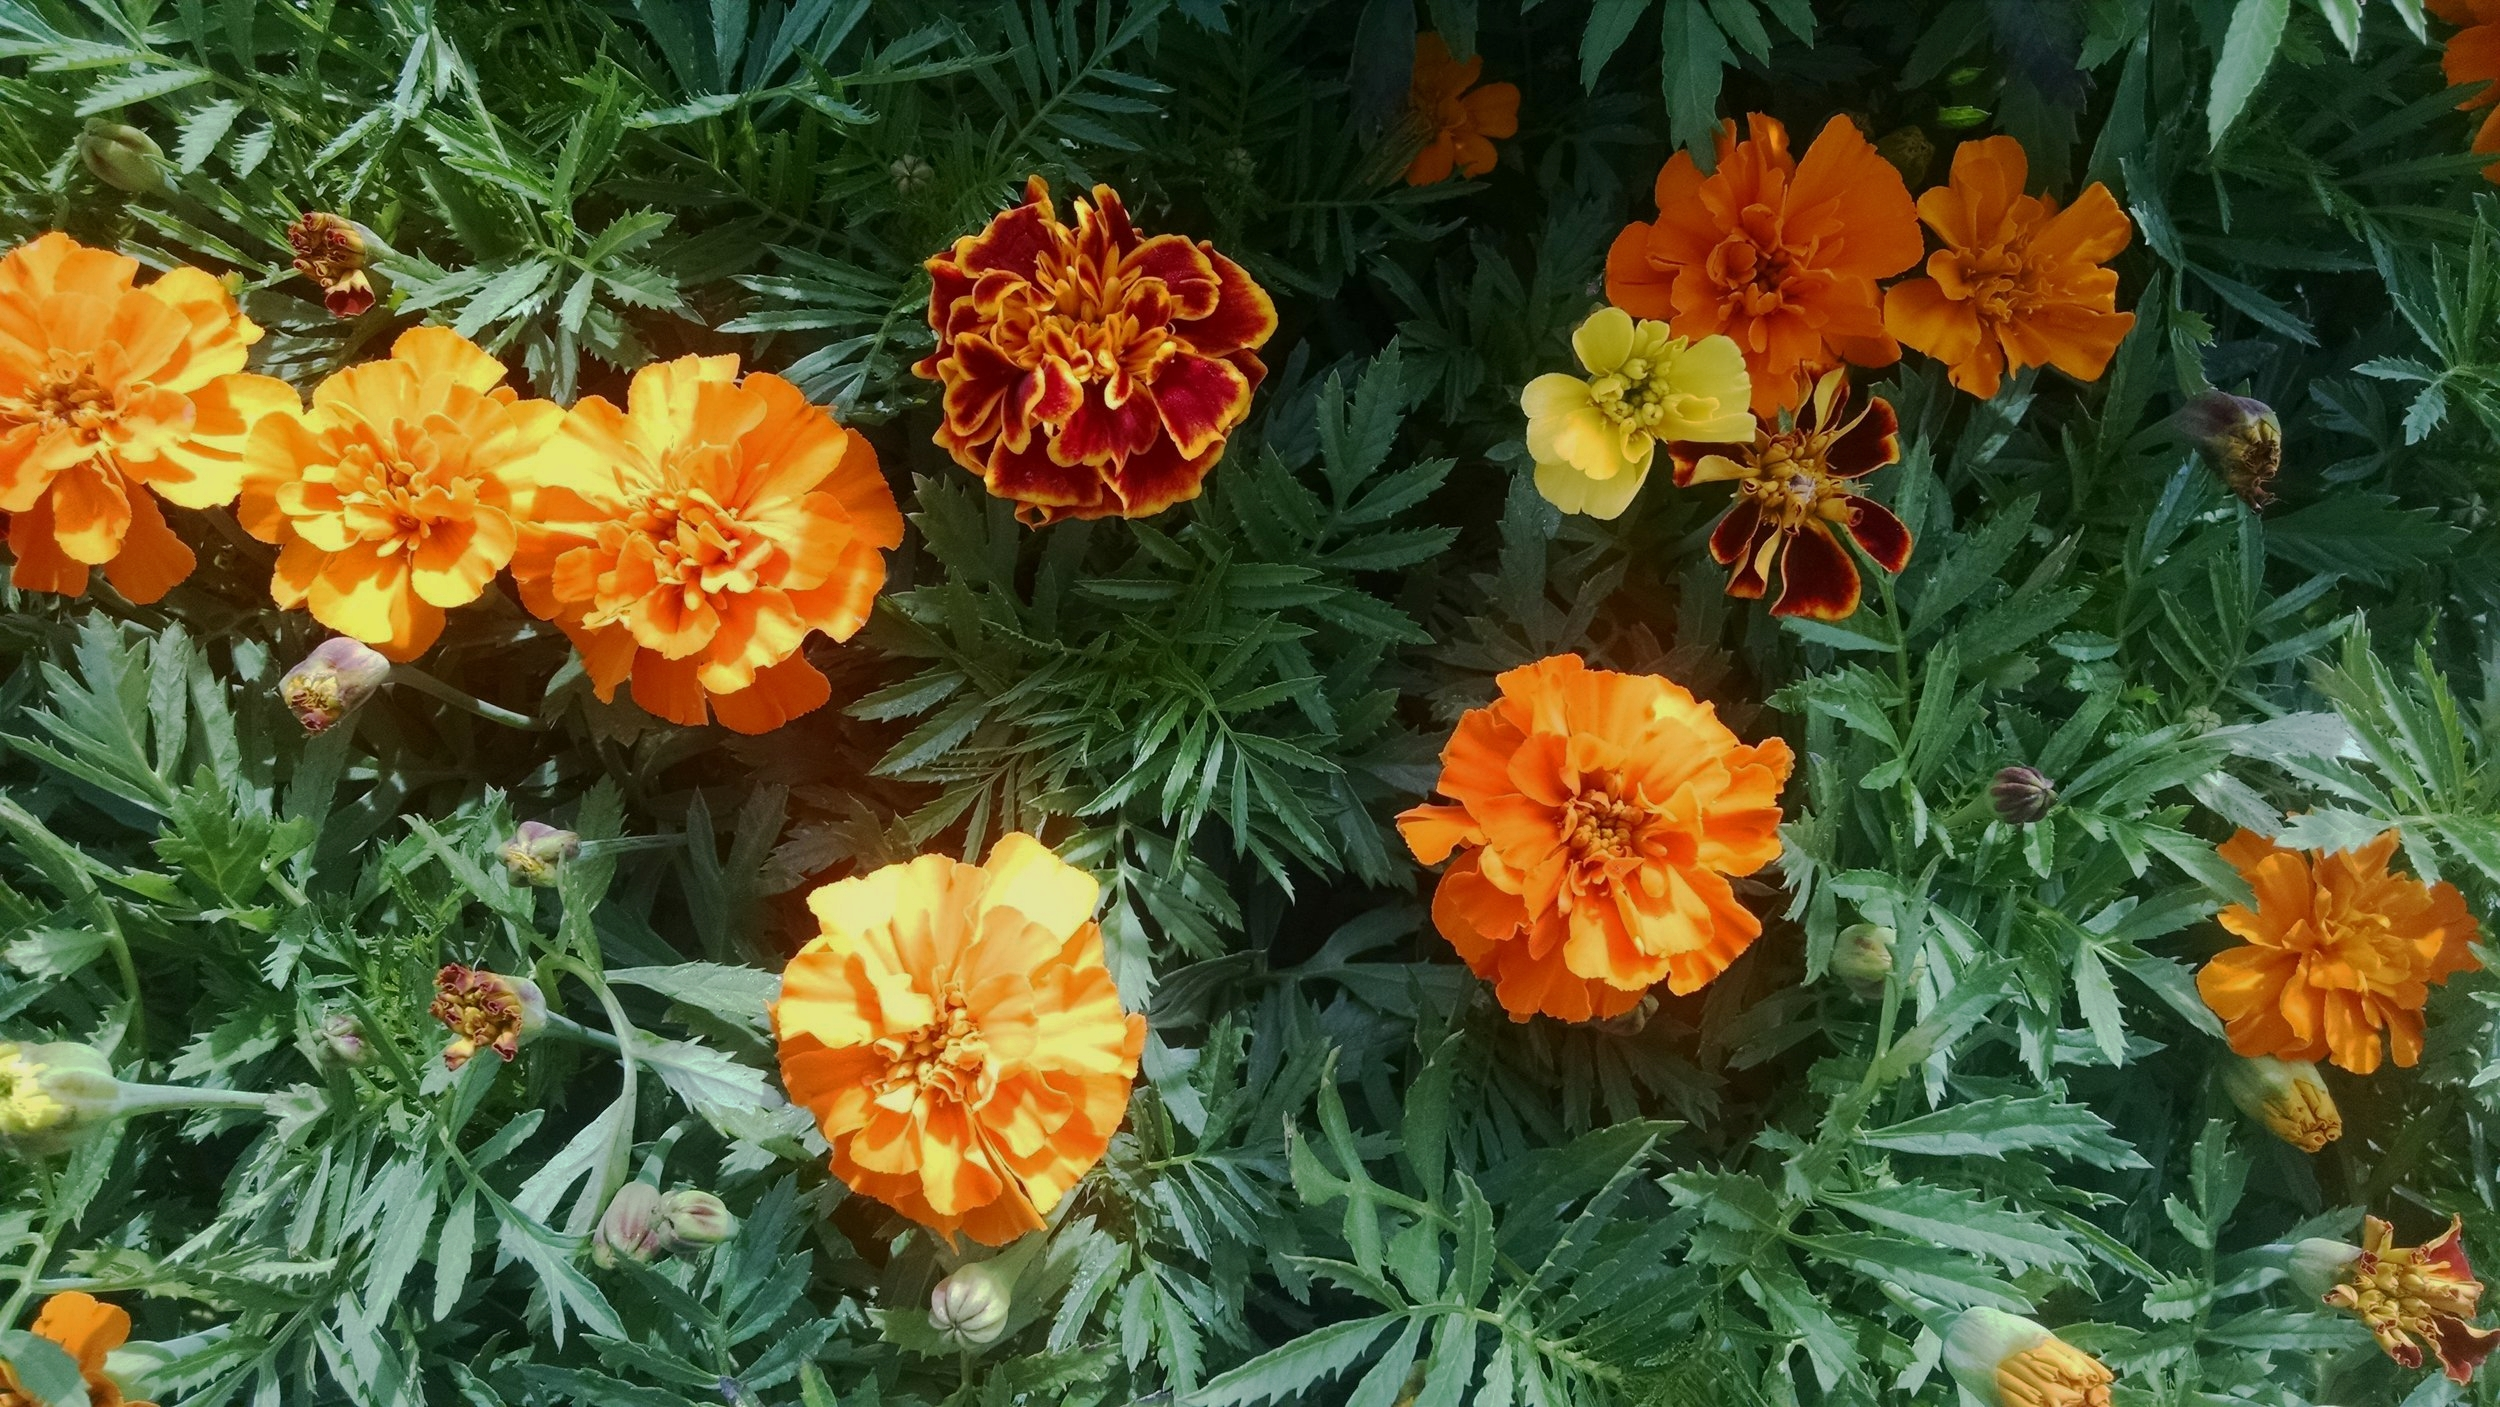 Marigolds under shade cloth outside